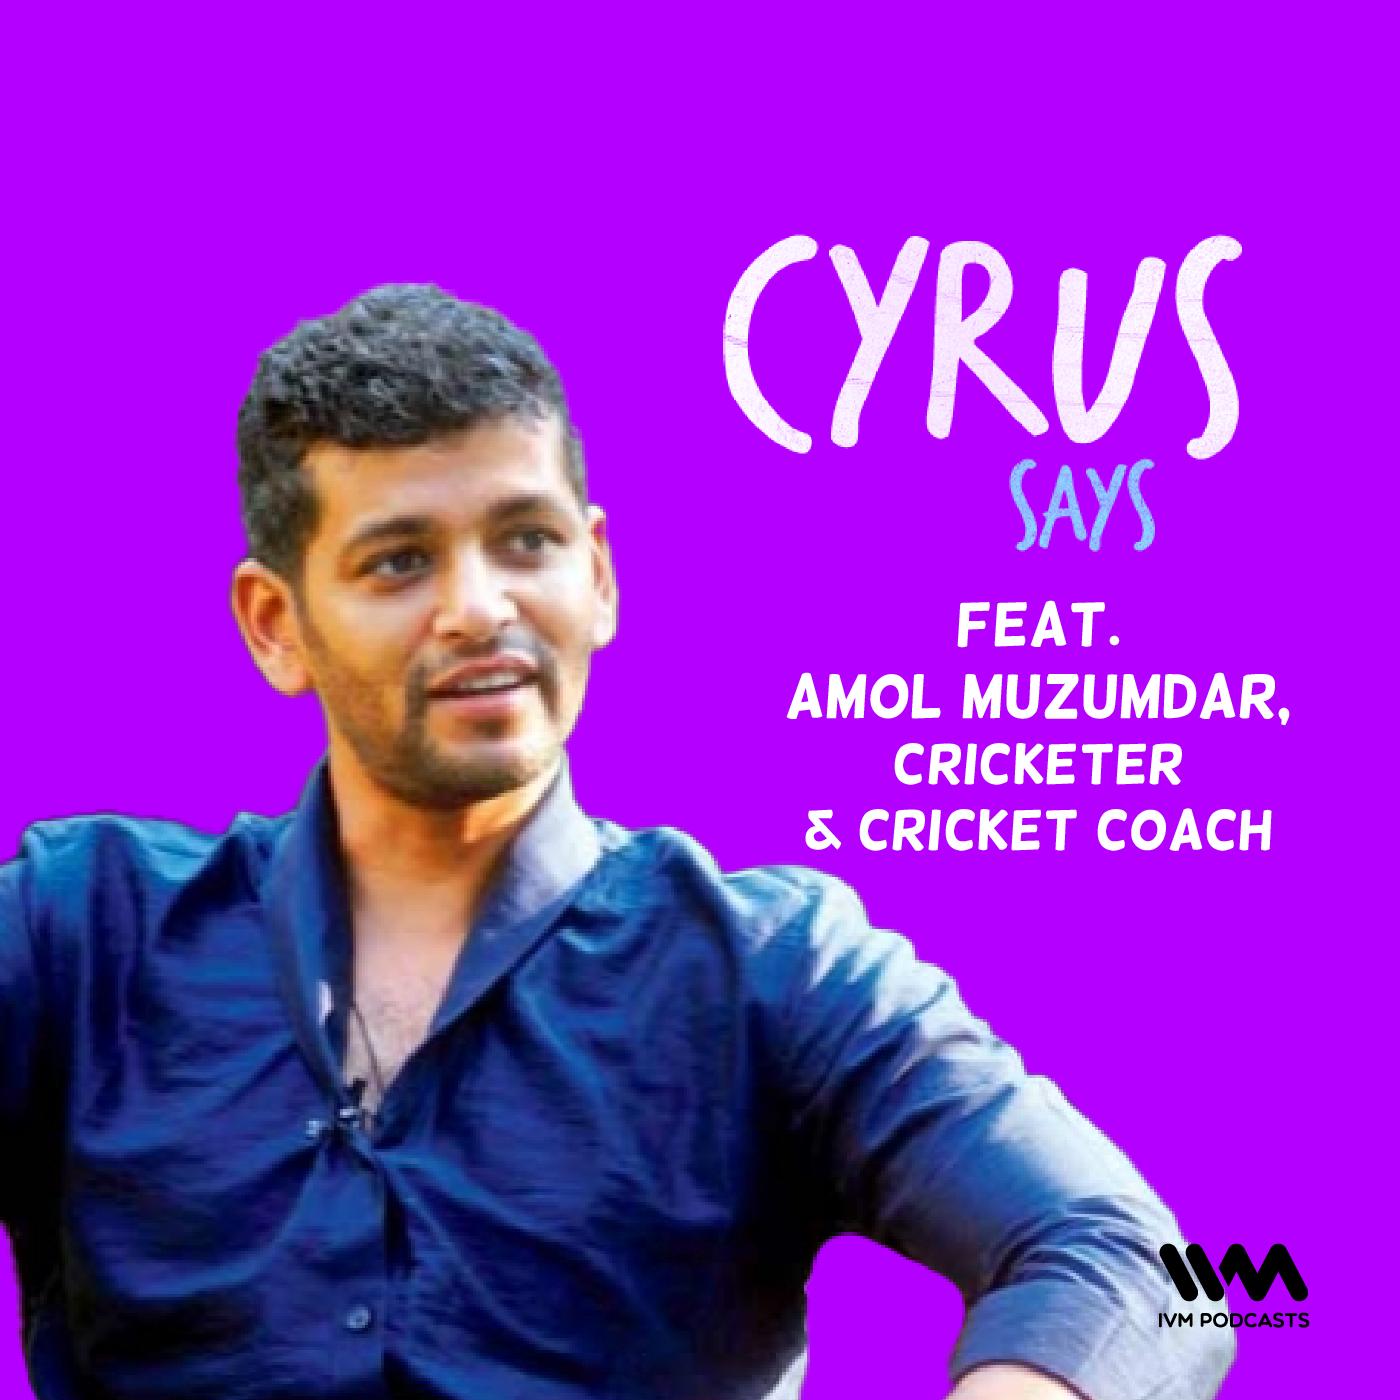 Ep. 628: feat. Amol Muzumdar